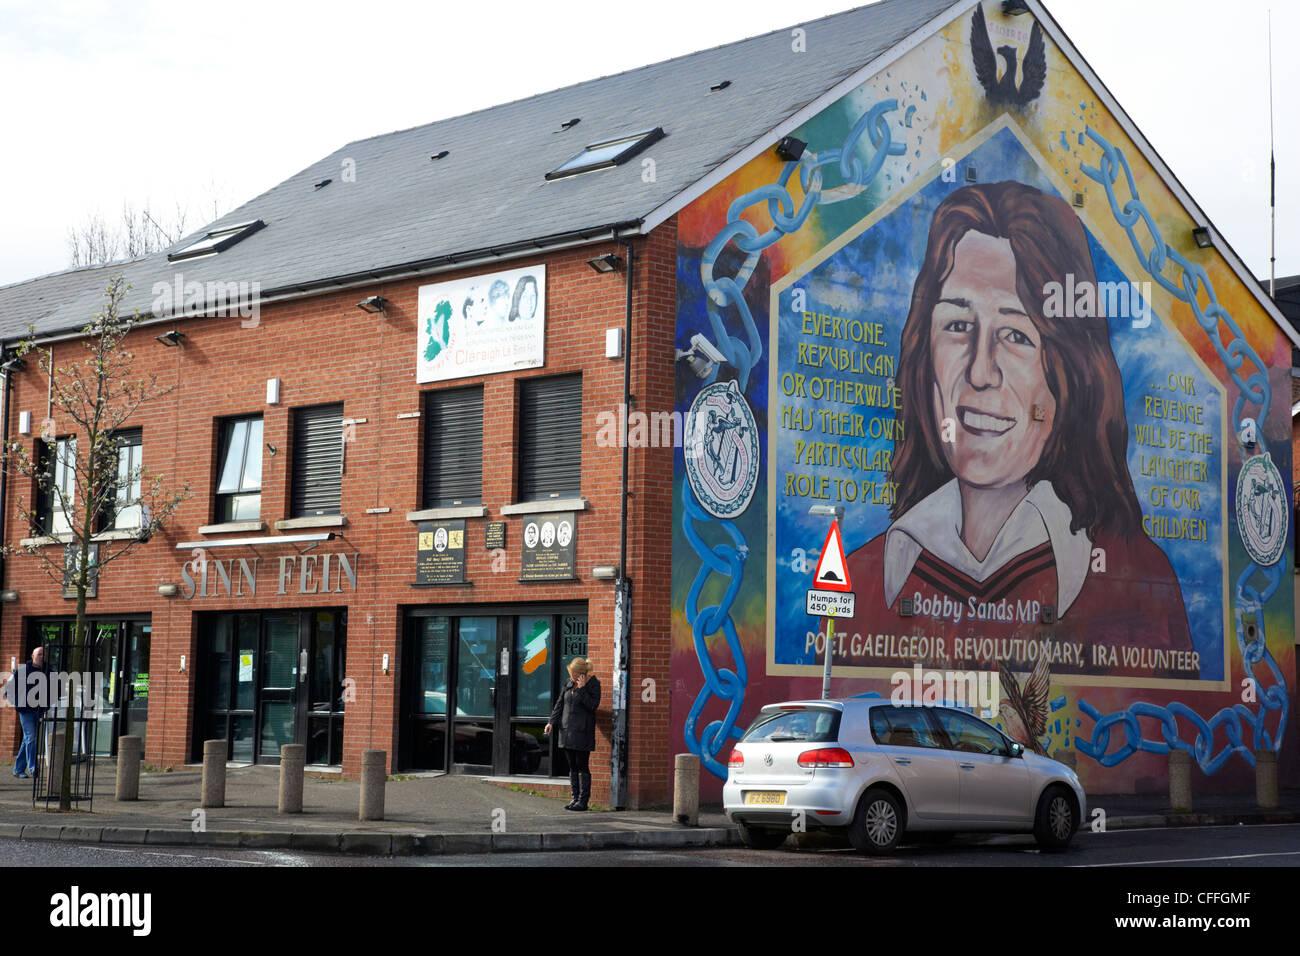 falls road sinn fein headquarters with bobby sands mural Belfast Northern Ireland UK - Stock Image